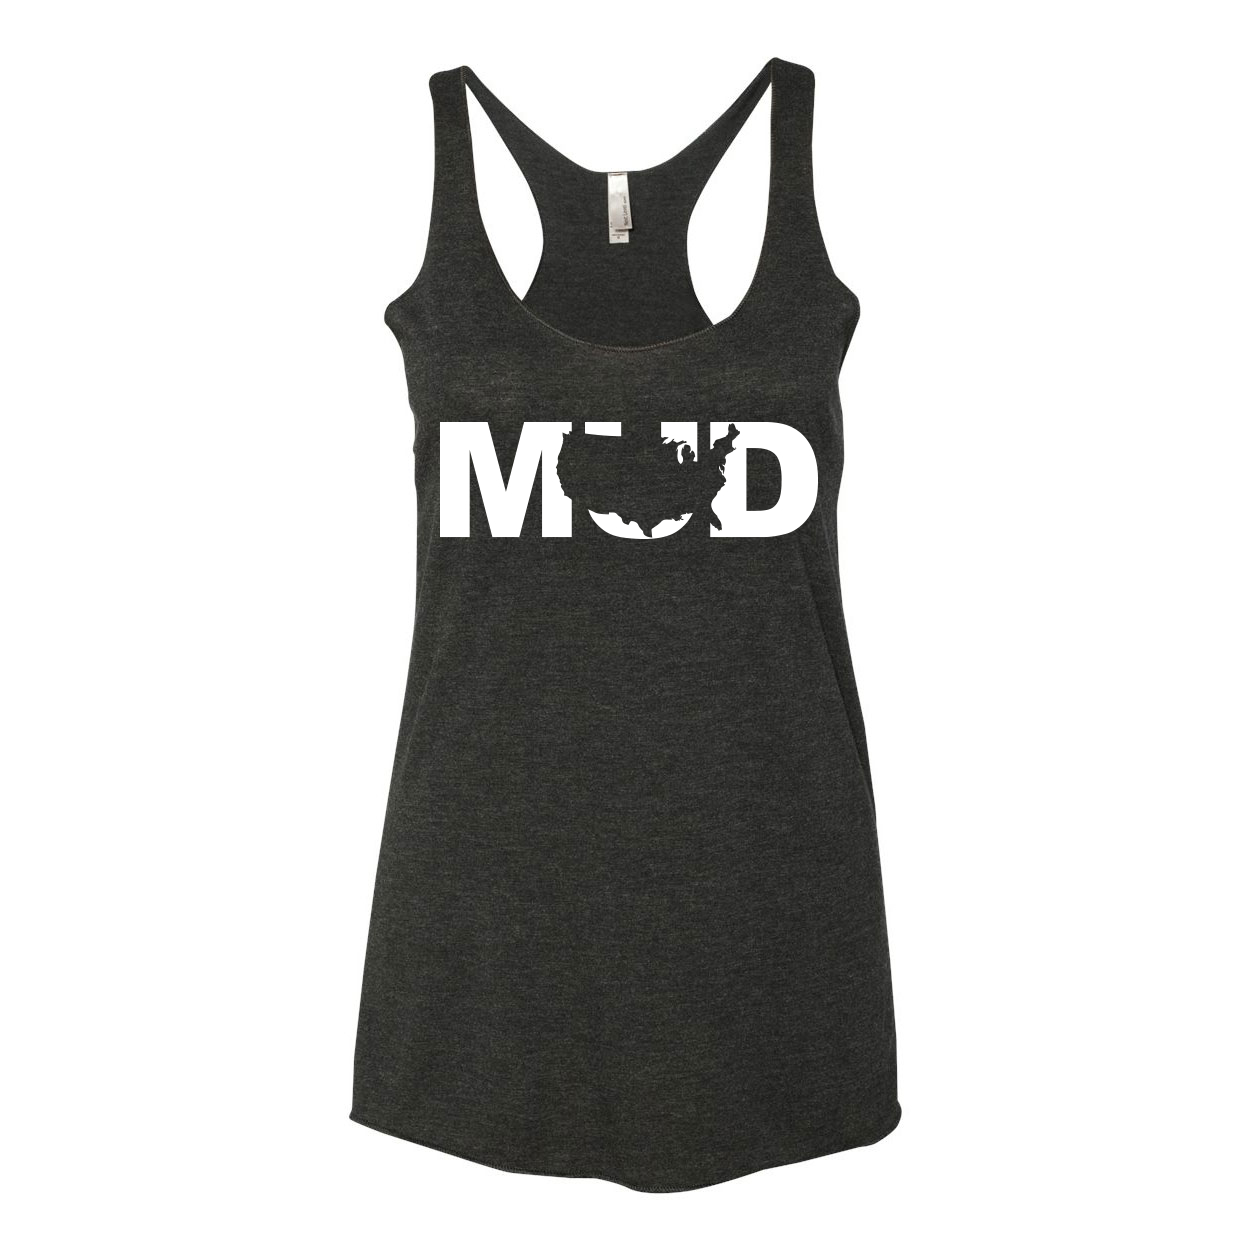 Mud United States Classic Women's Ultra Thin Tank Top Black (White Logo)